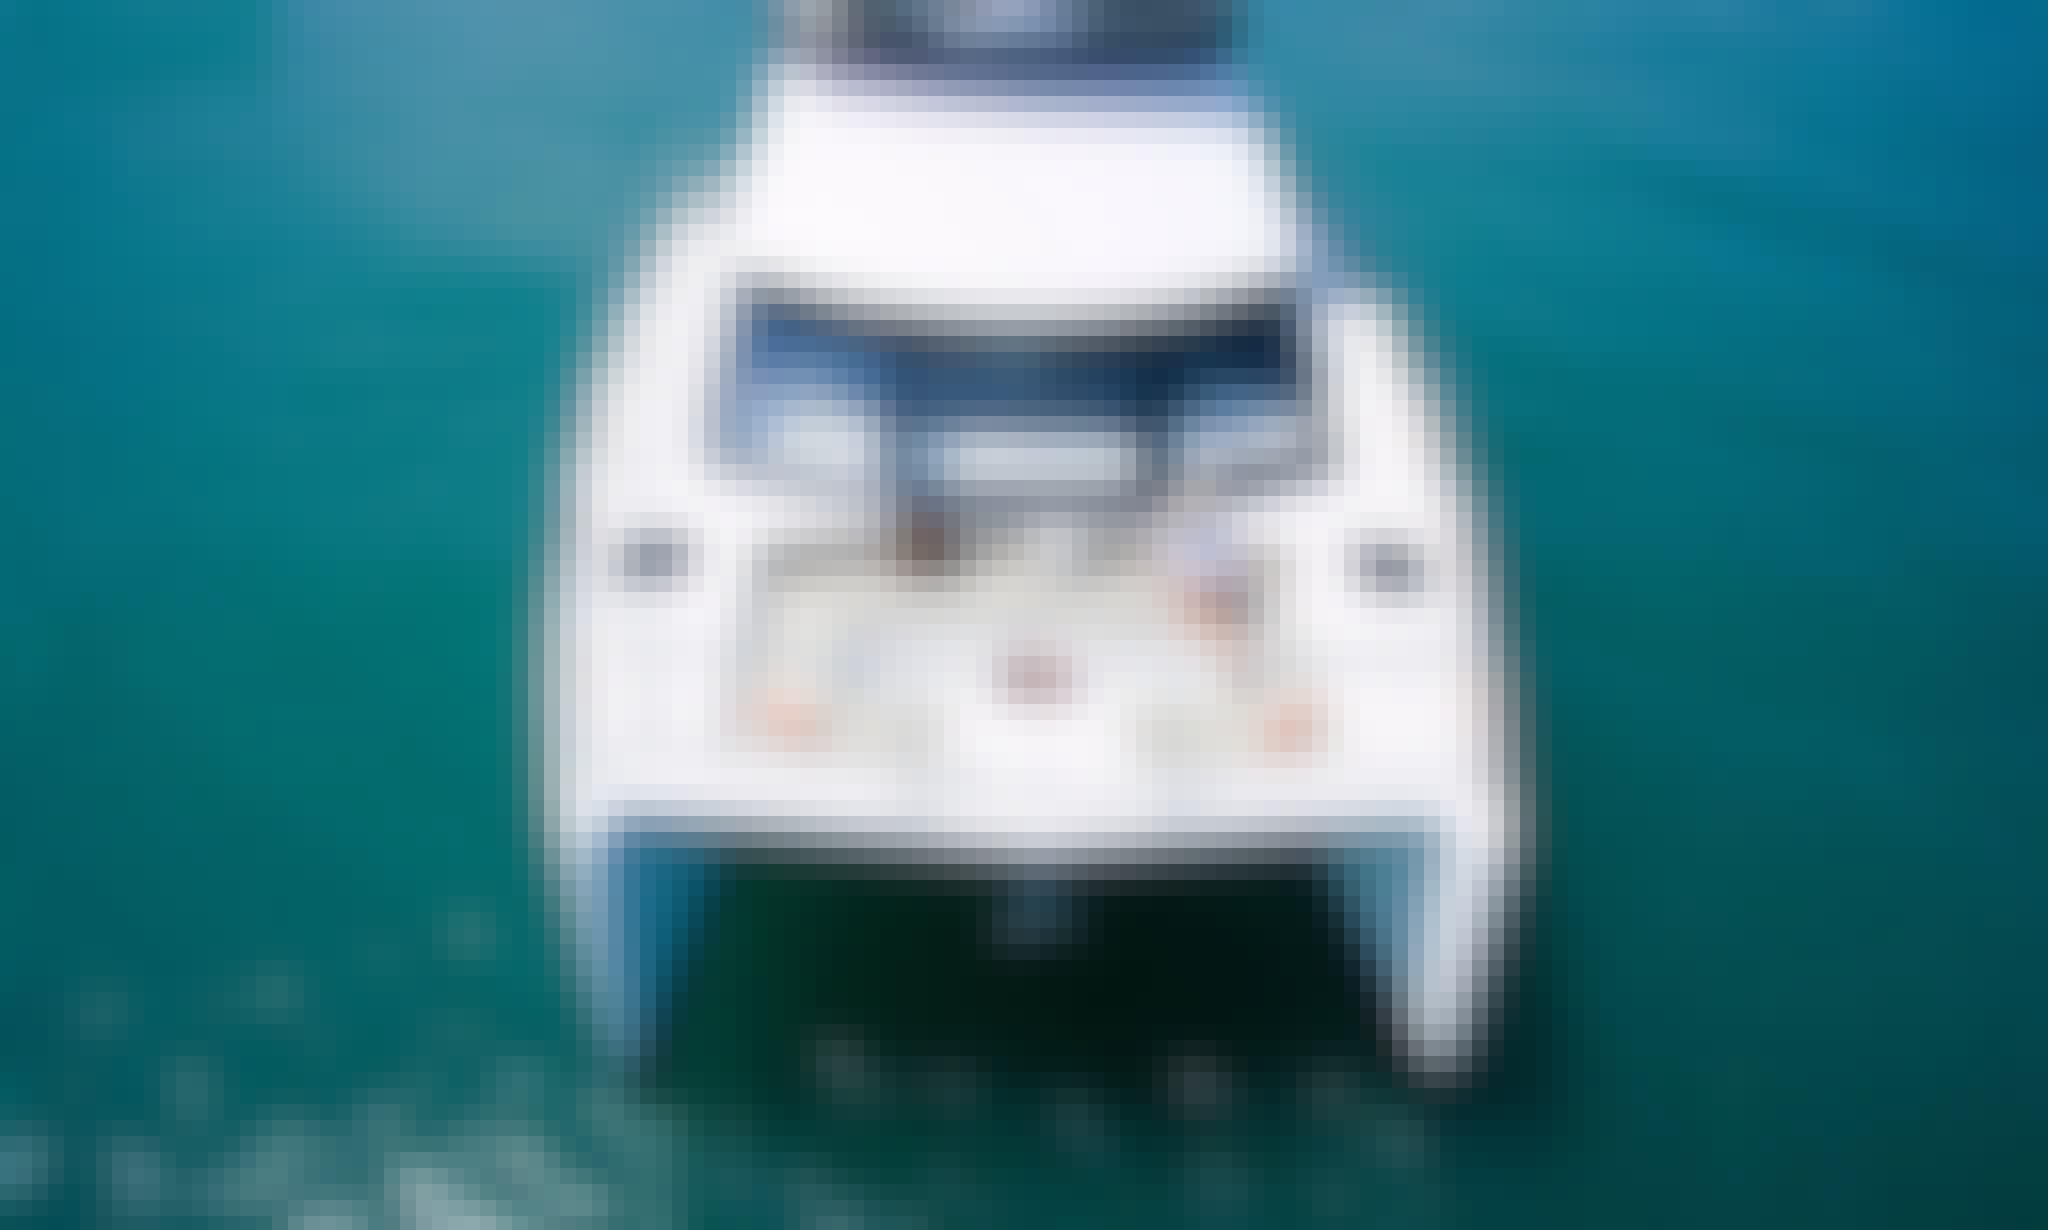 Jado motor yacht at Pattaya, Thailand